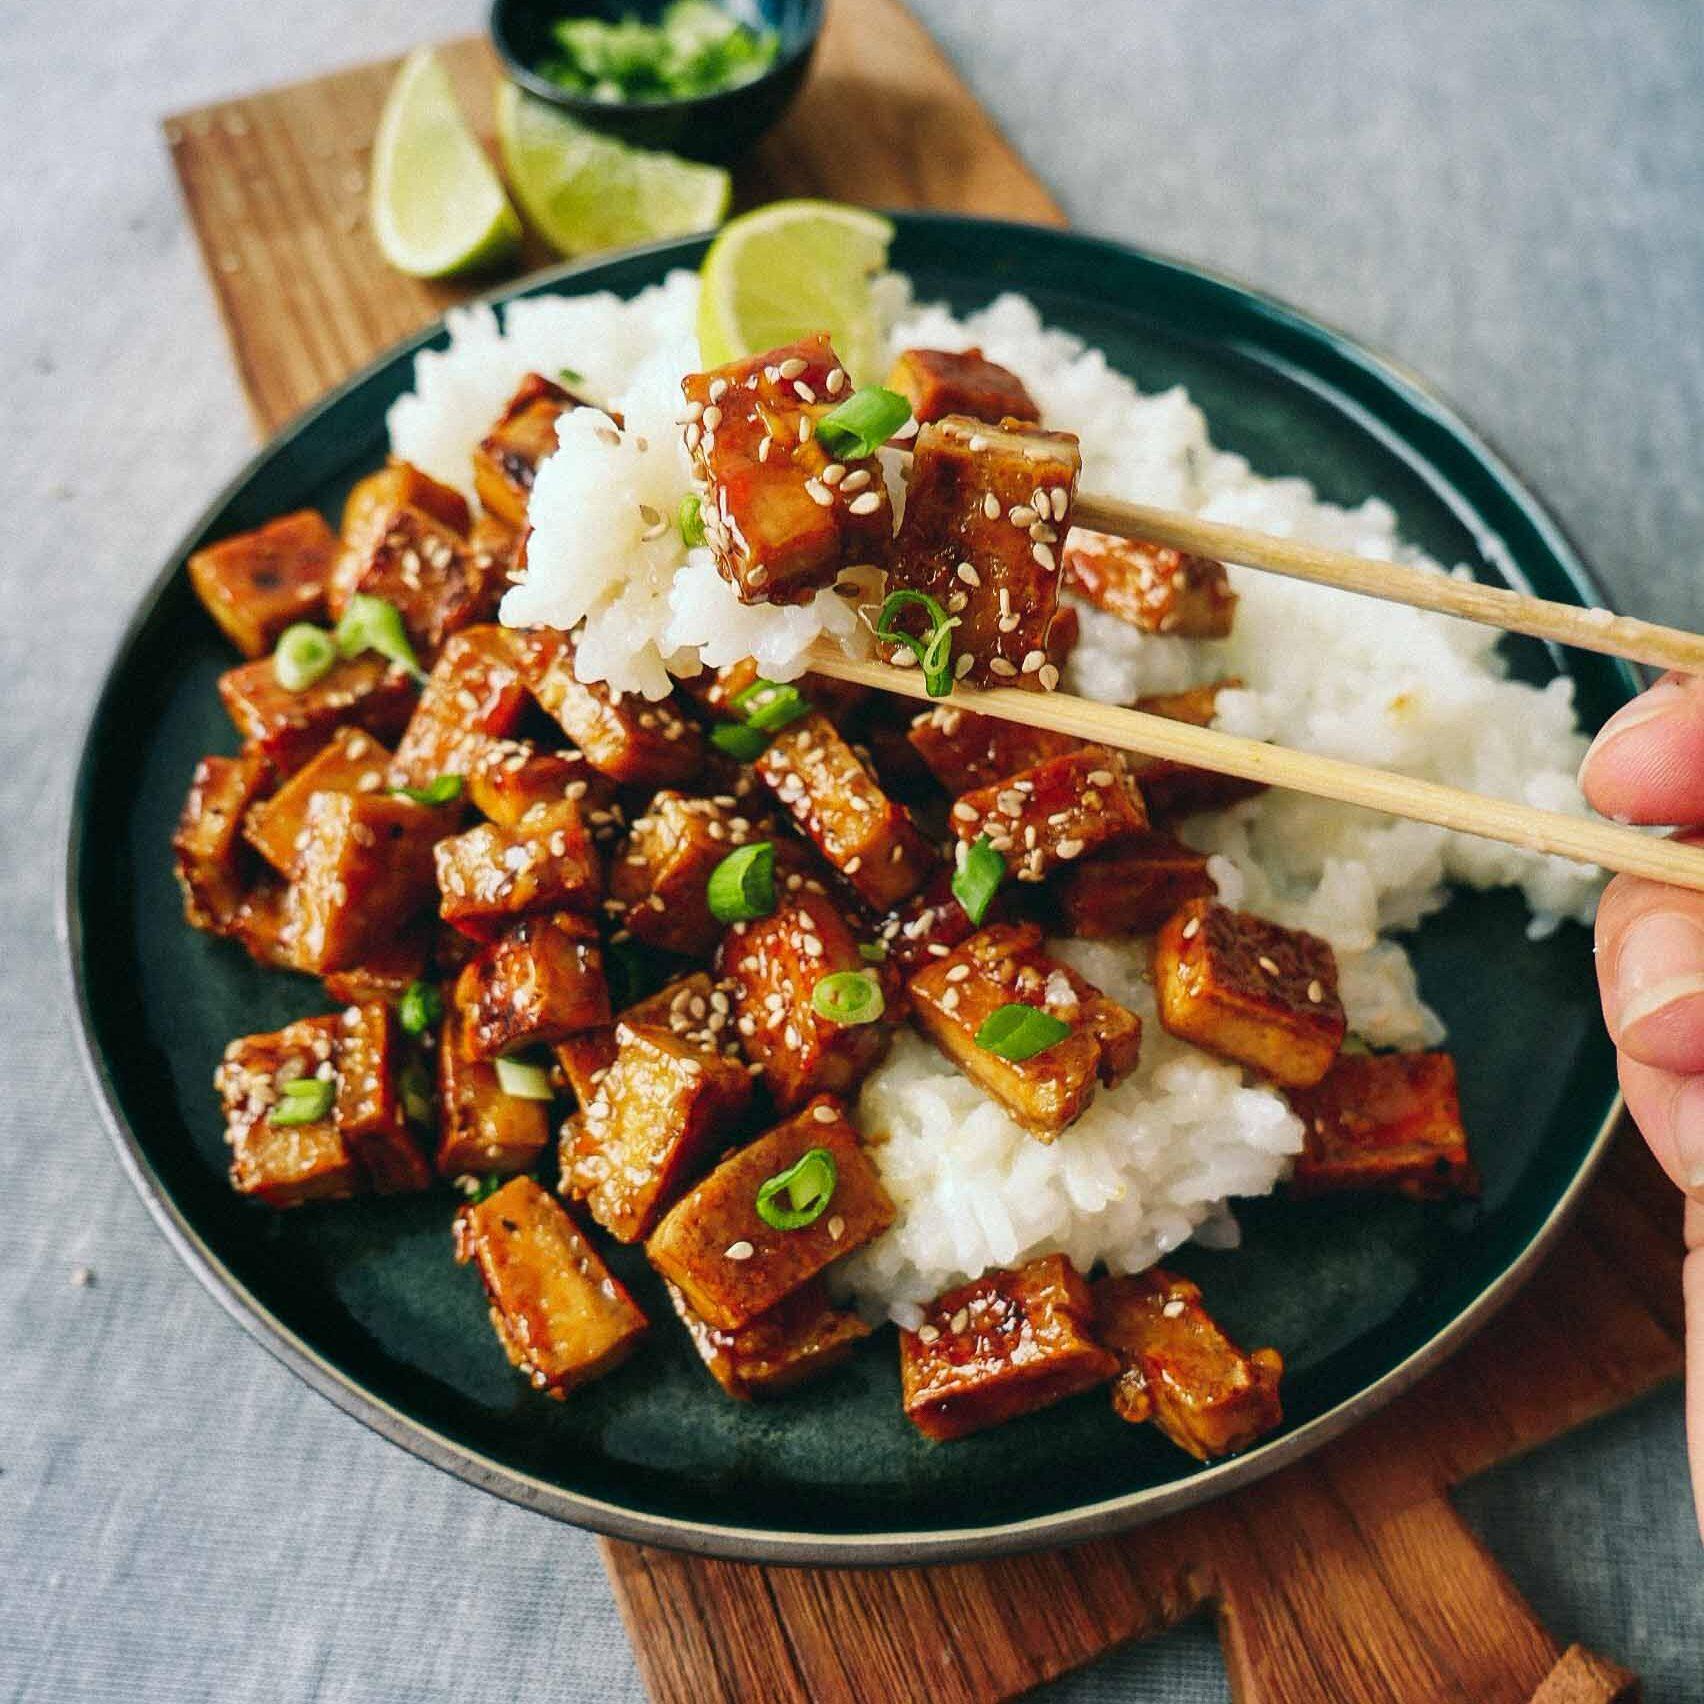 Sweet fried tofu